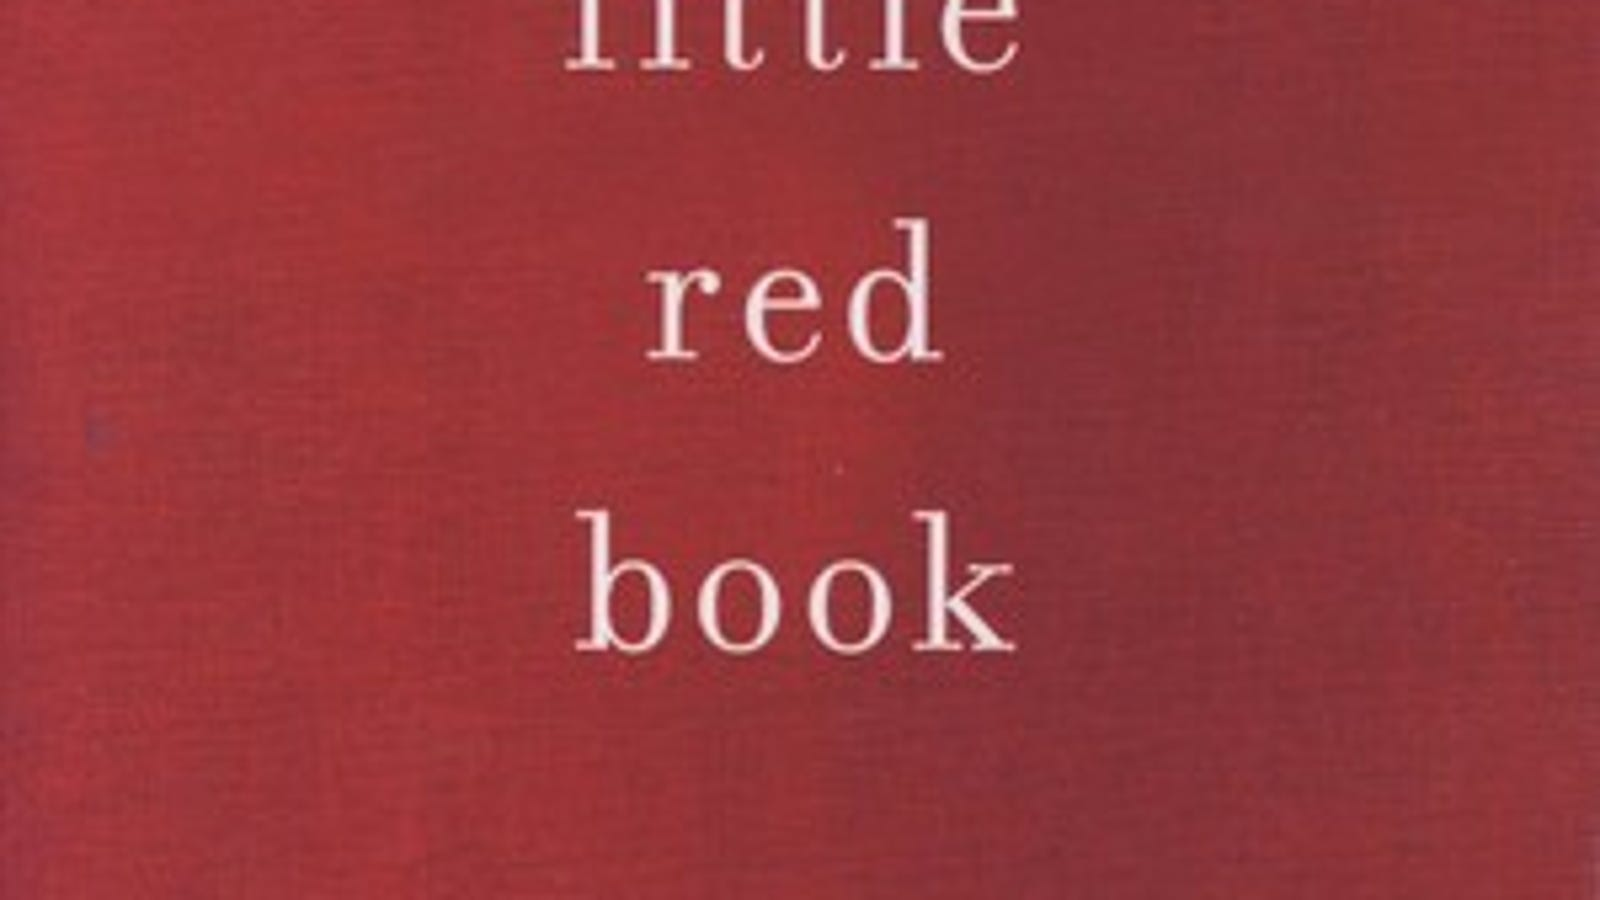 my little red book rachel kauder nalebuff pdf